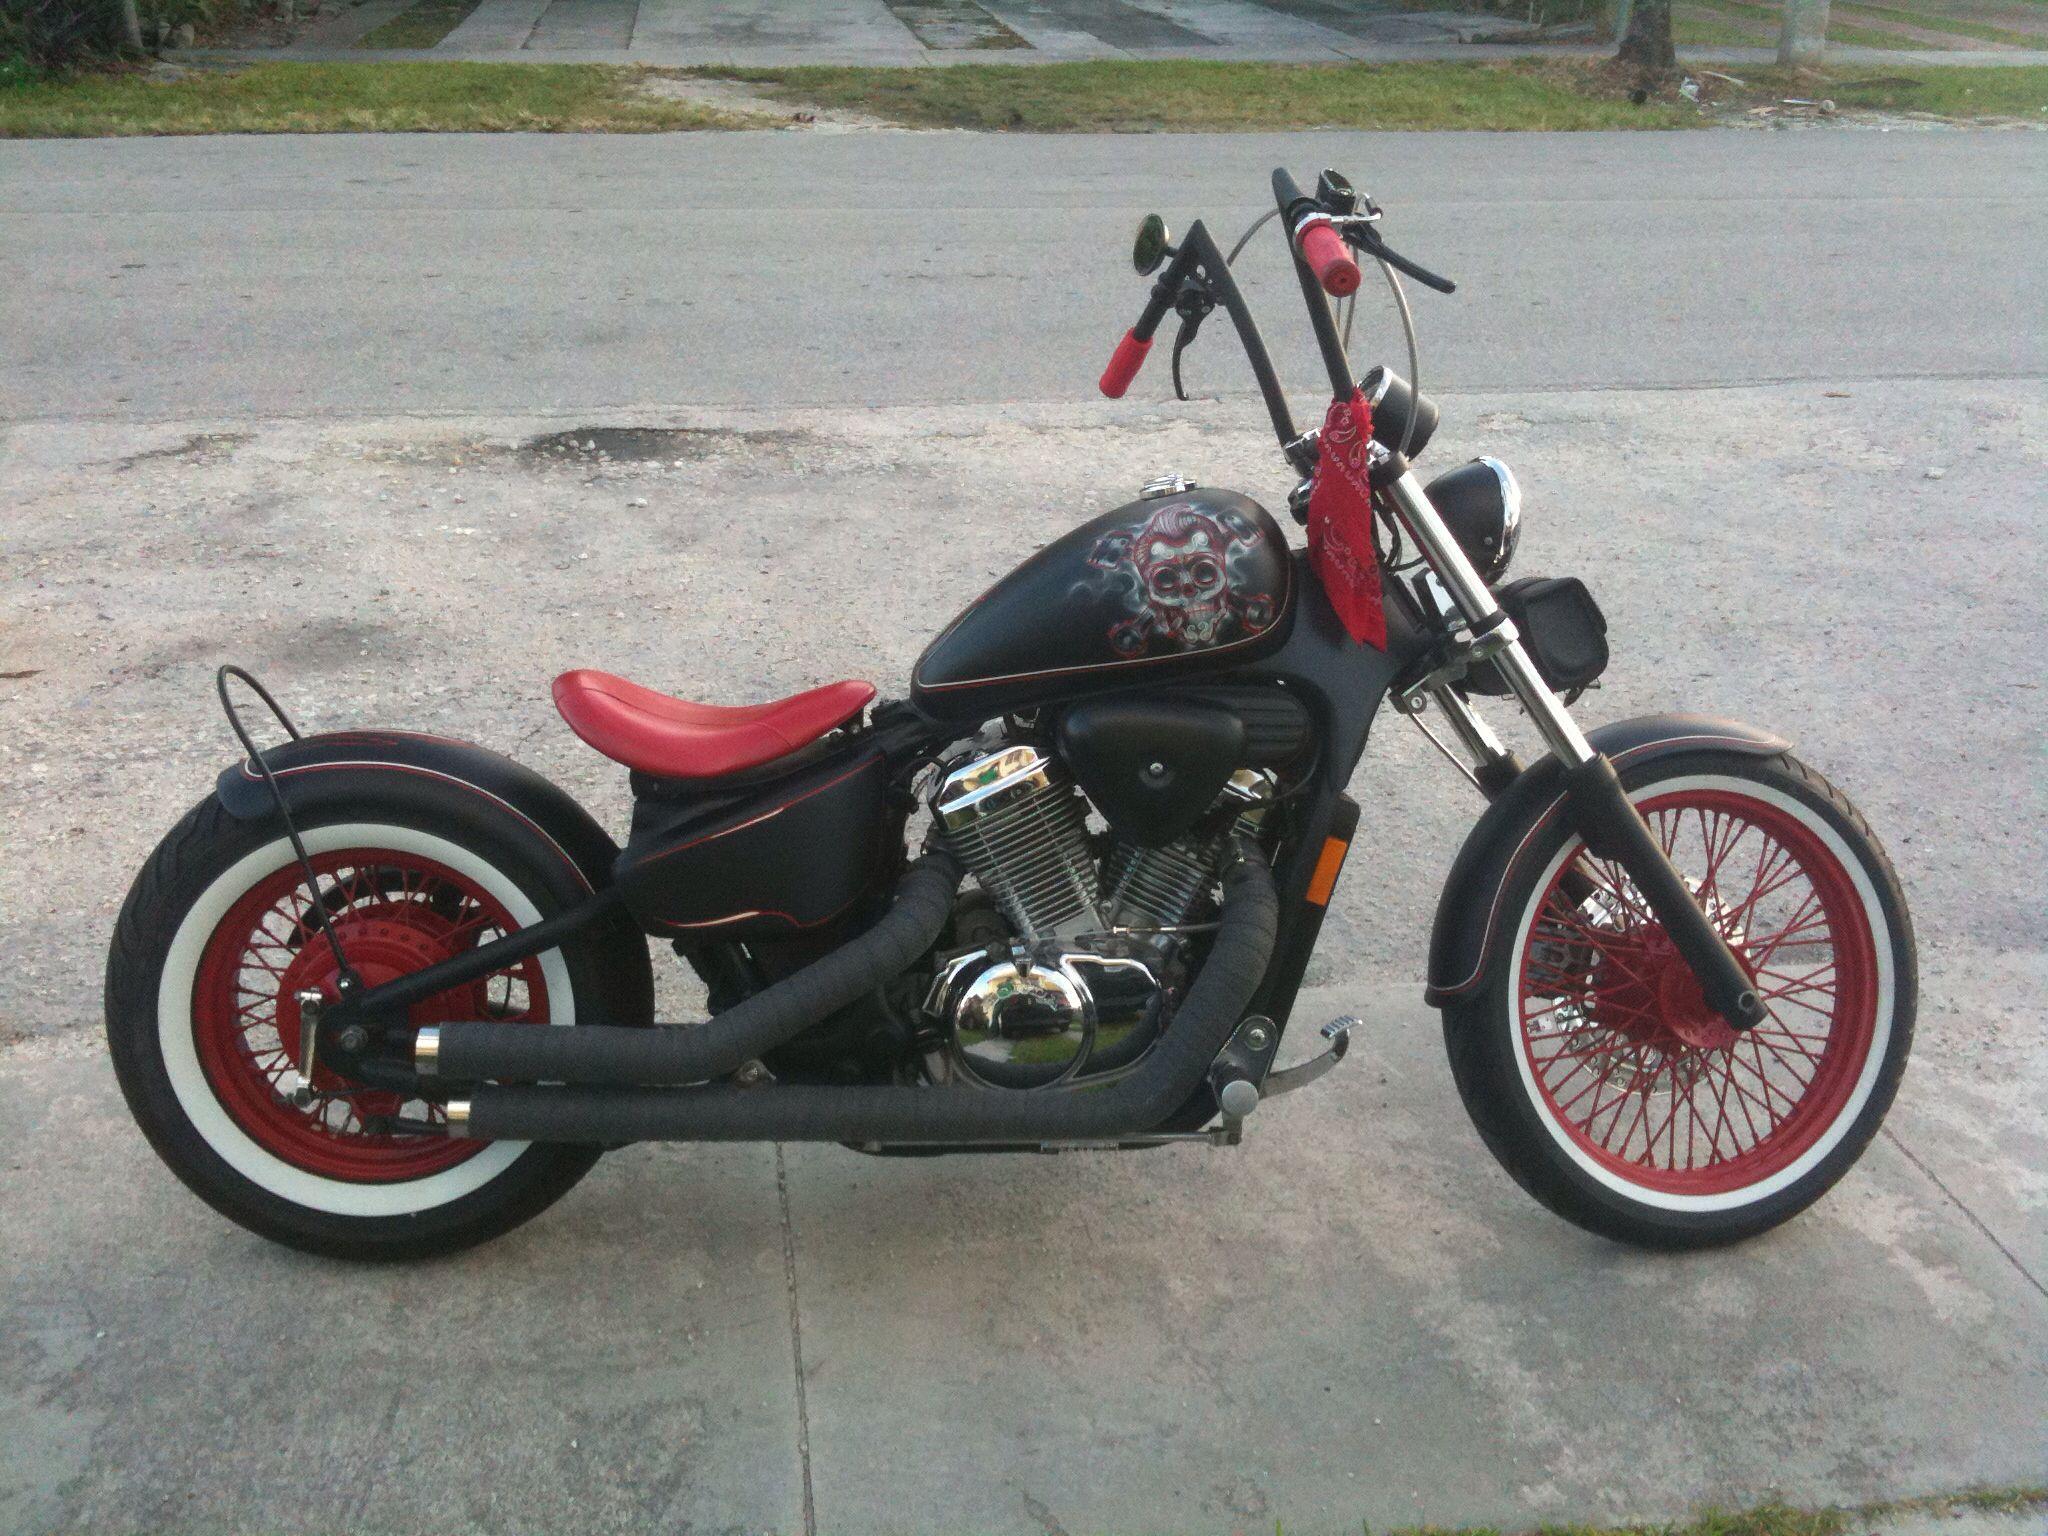 Pin by Joe on bikes | Pinterest | Bobbers, Honda and Bobber motorcycle